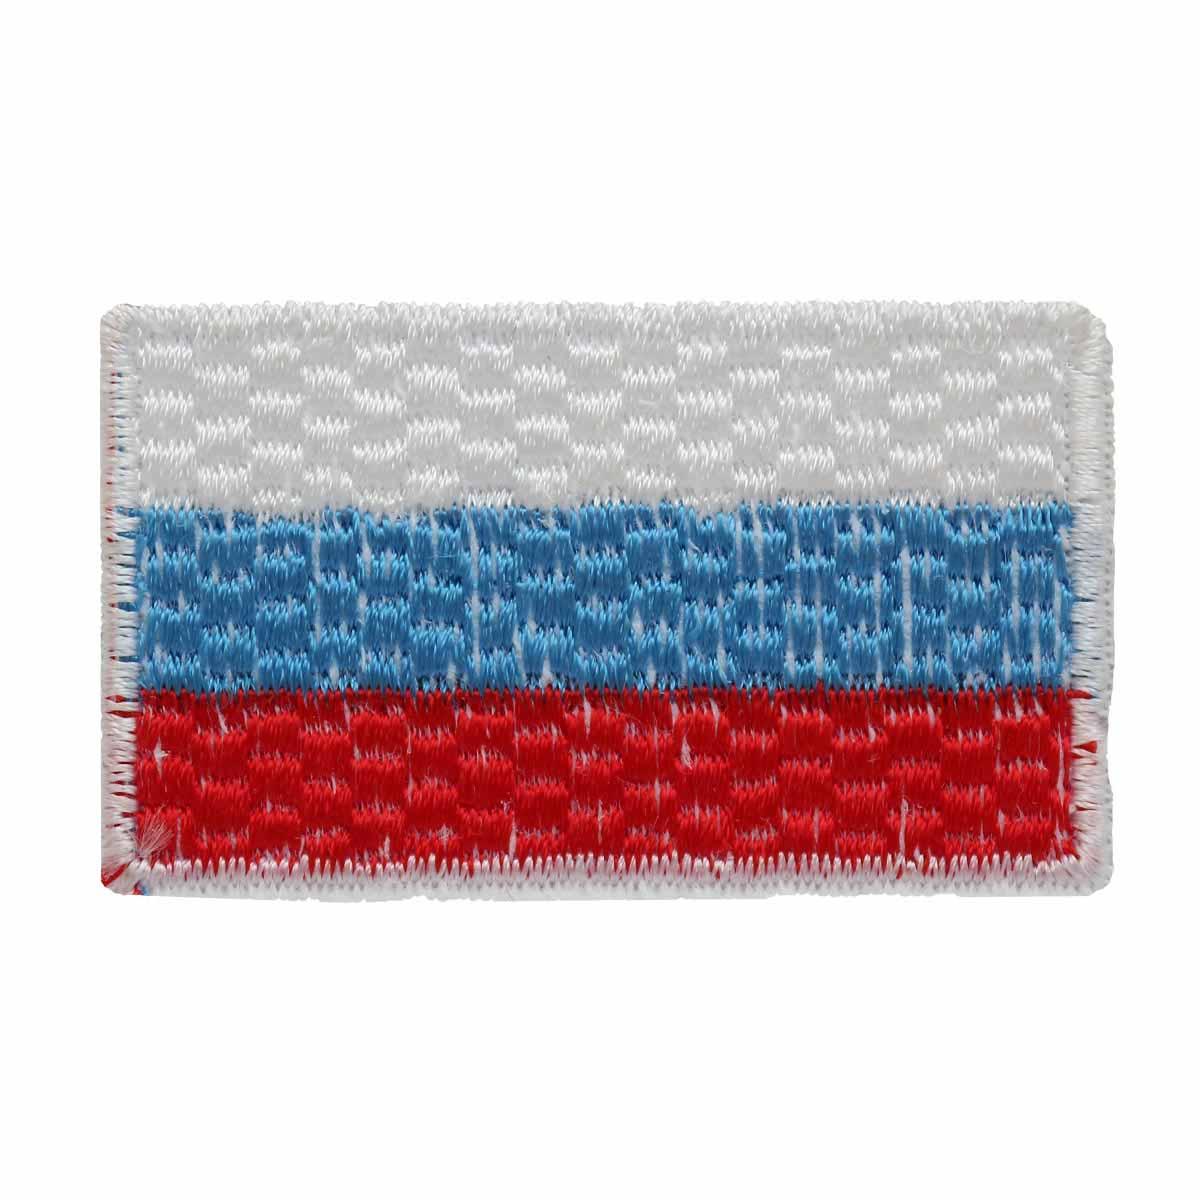 "Термоаппликация LM-80375 ""Флаг России"" 1 шт., Hobby&Pro"